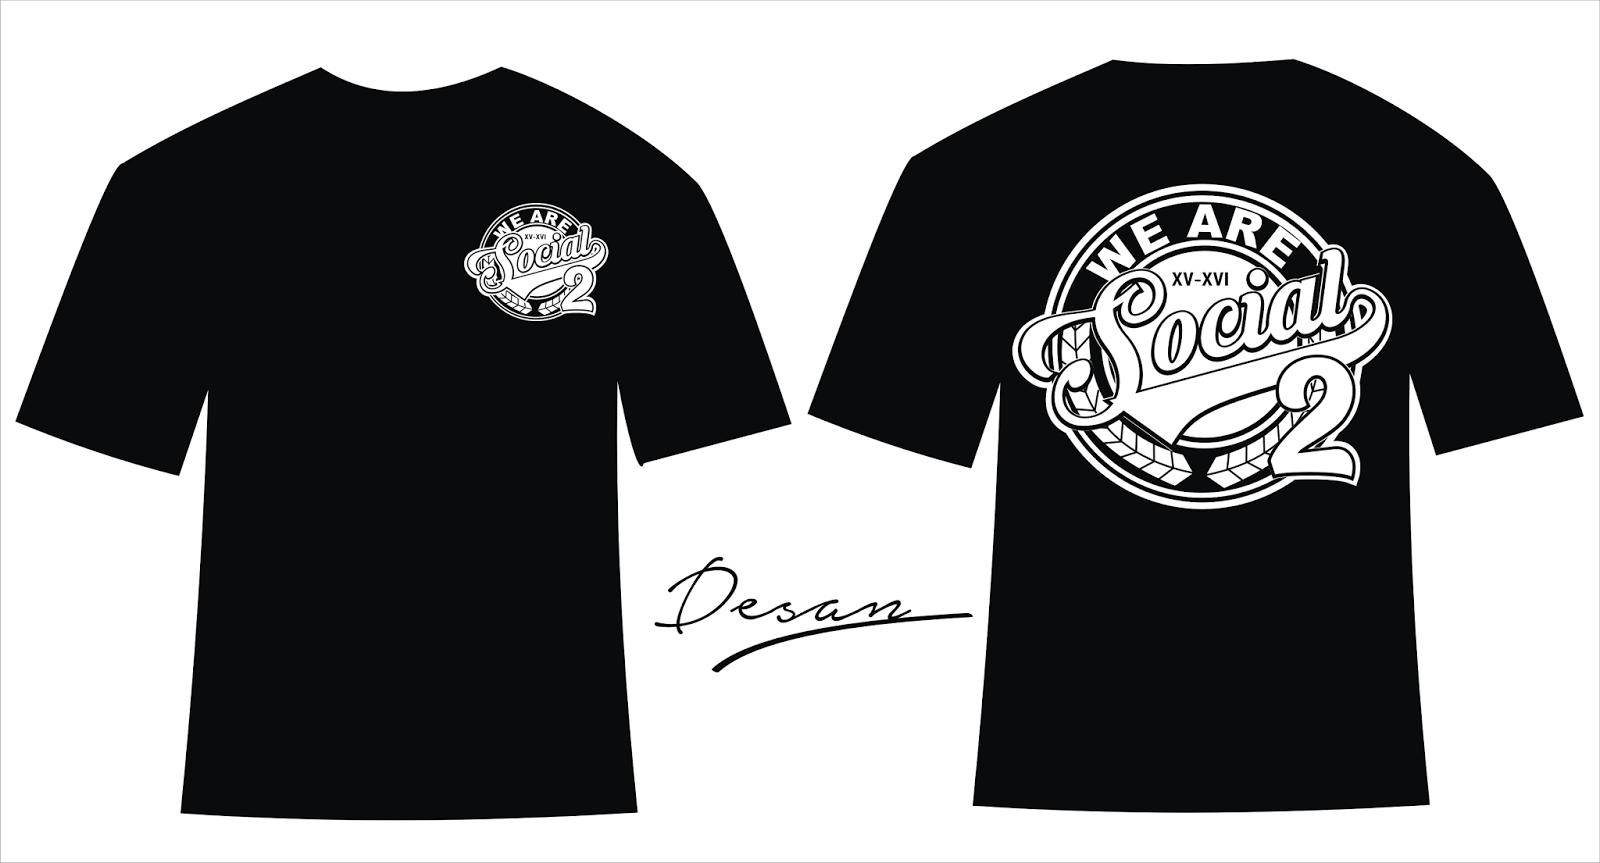 Contoh desain t shirt kelas - Desain Kaos Kelas Xii Ips 2